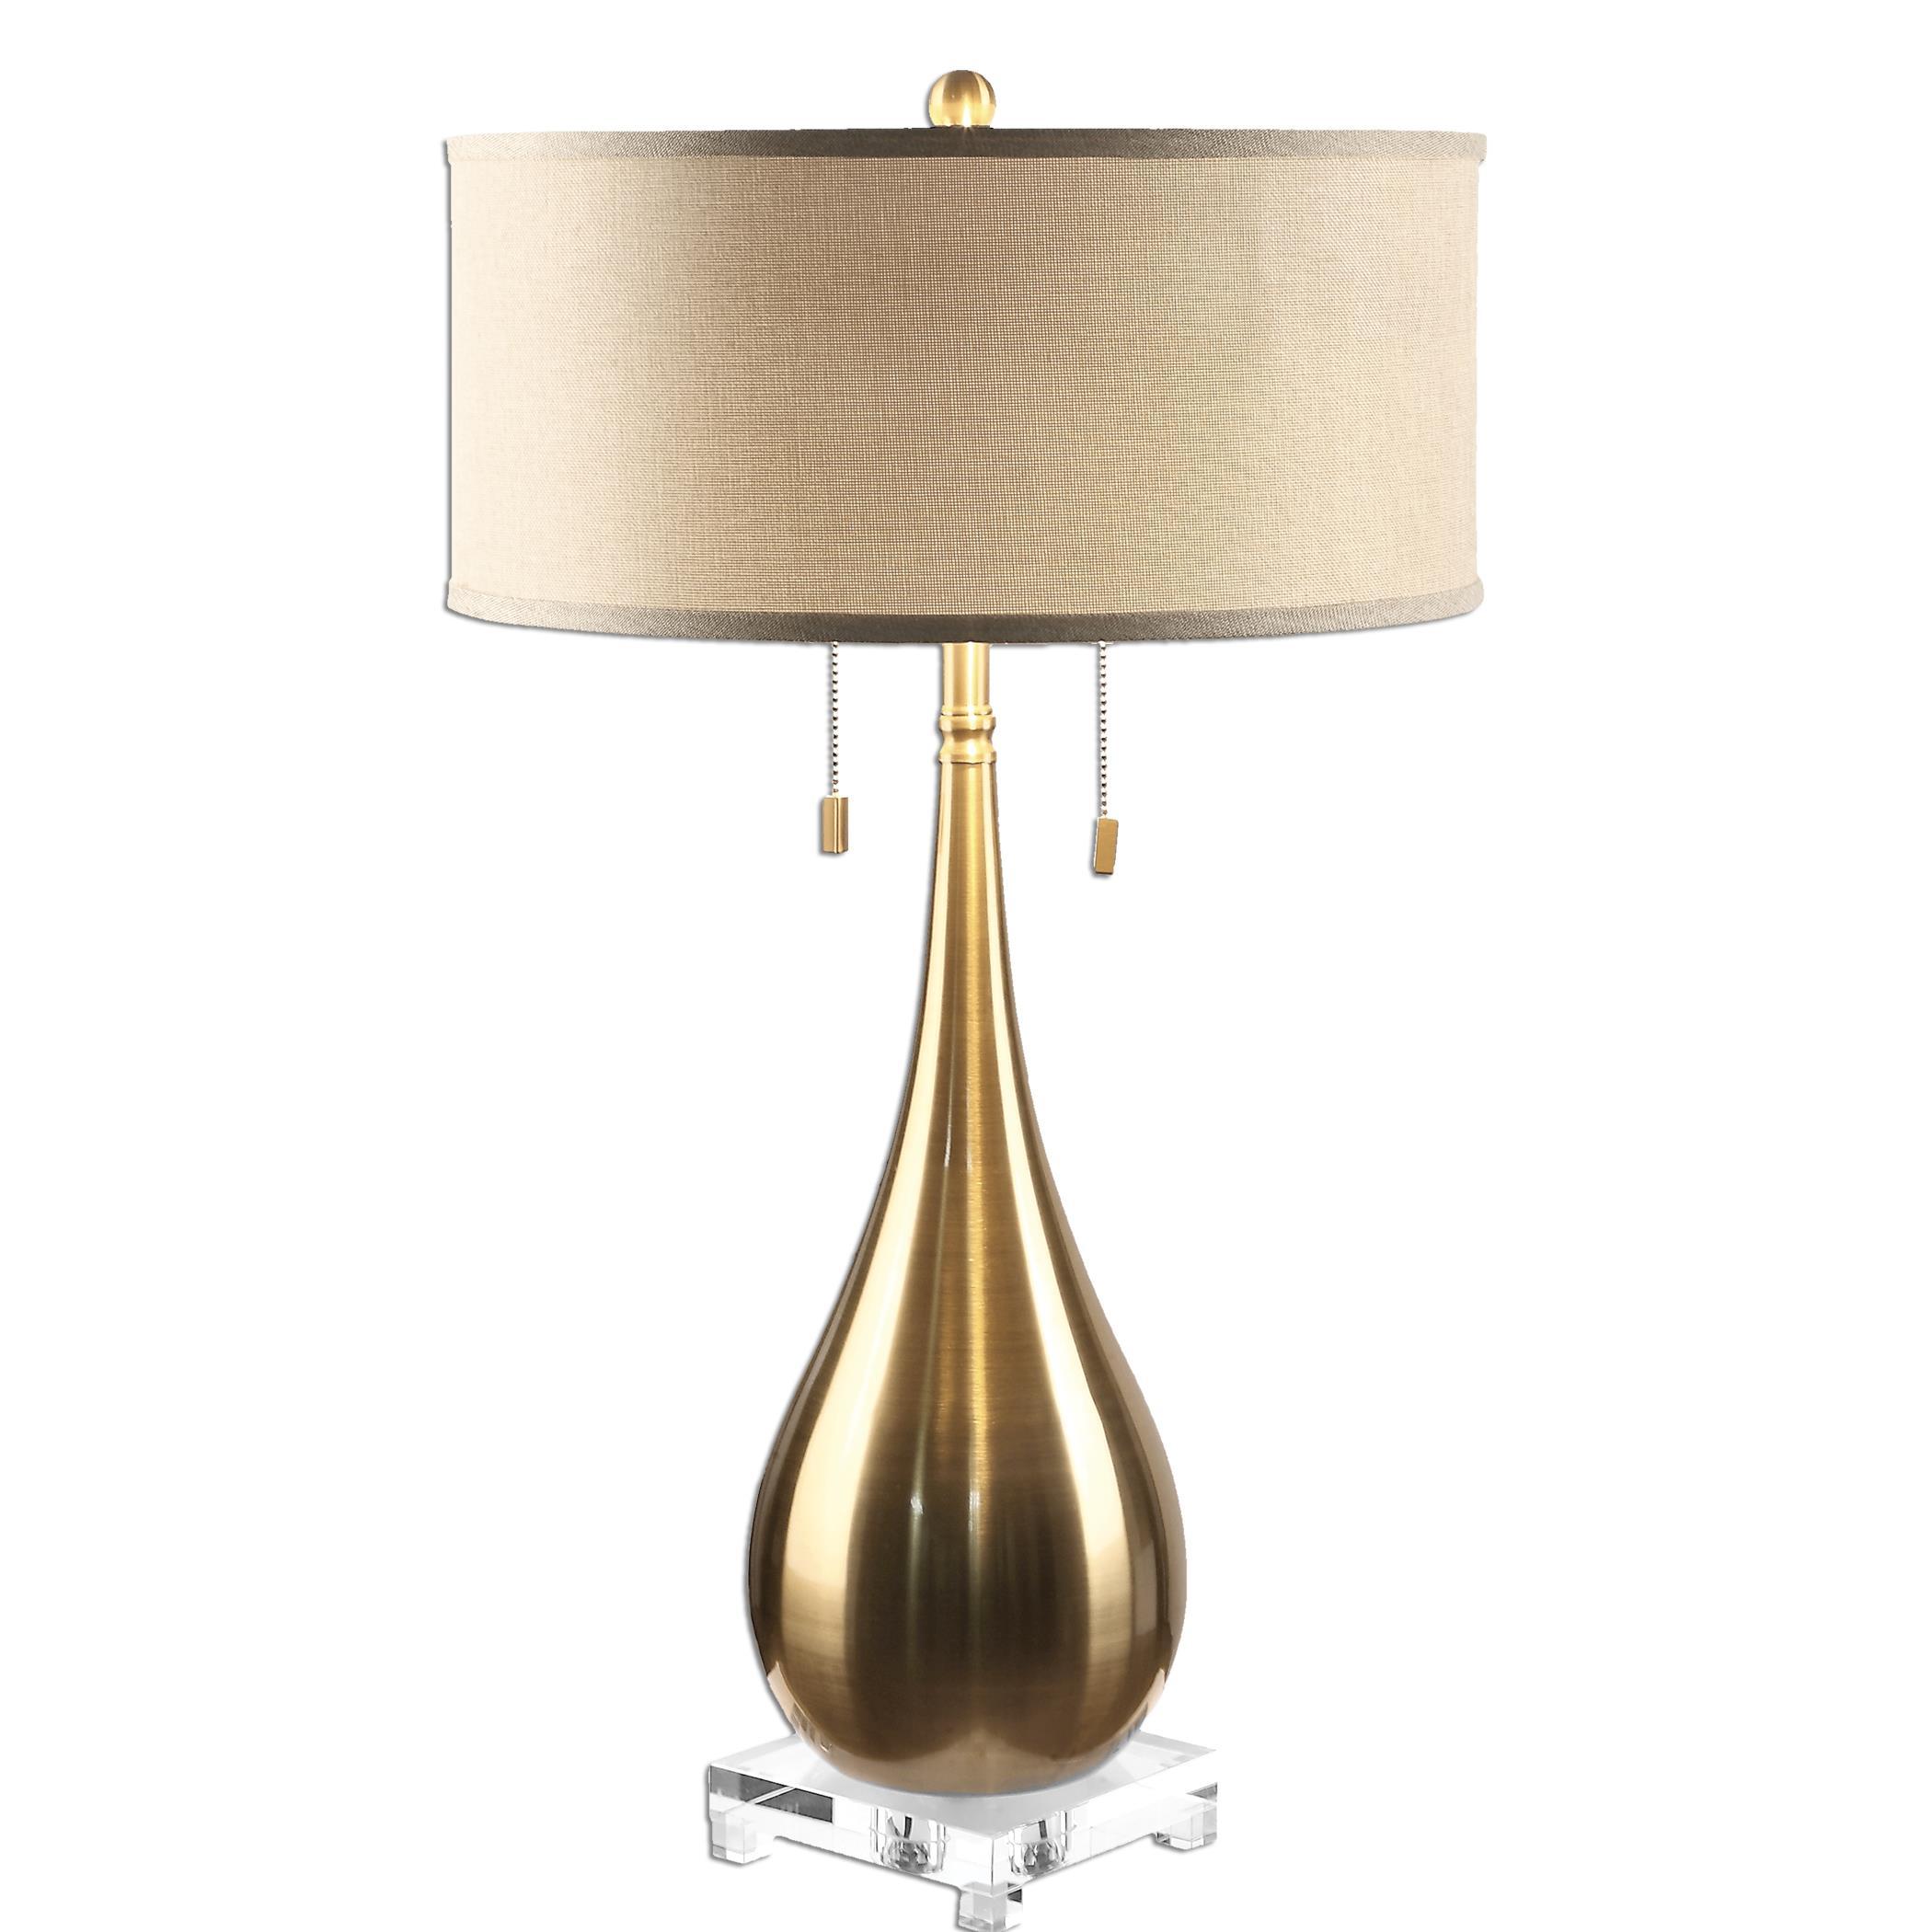 Lagrima Brushed Brass Lamp